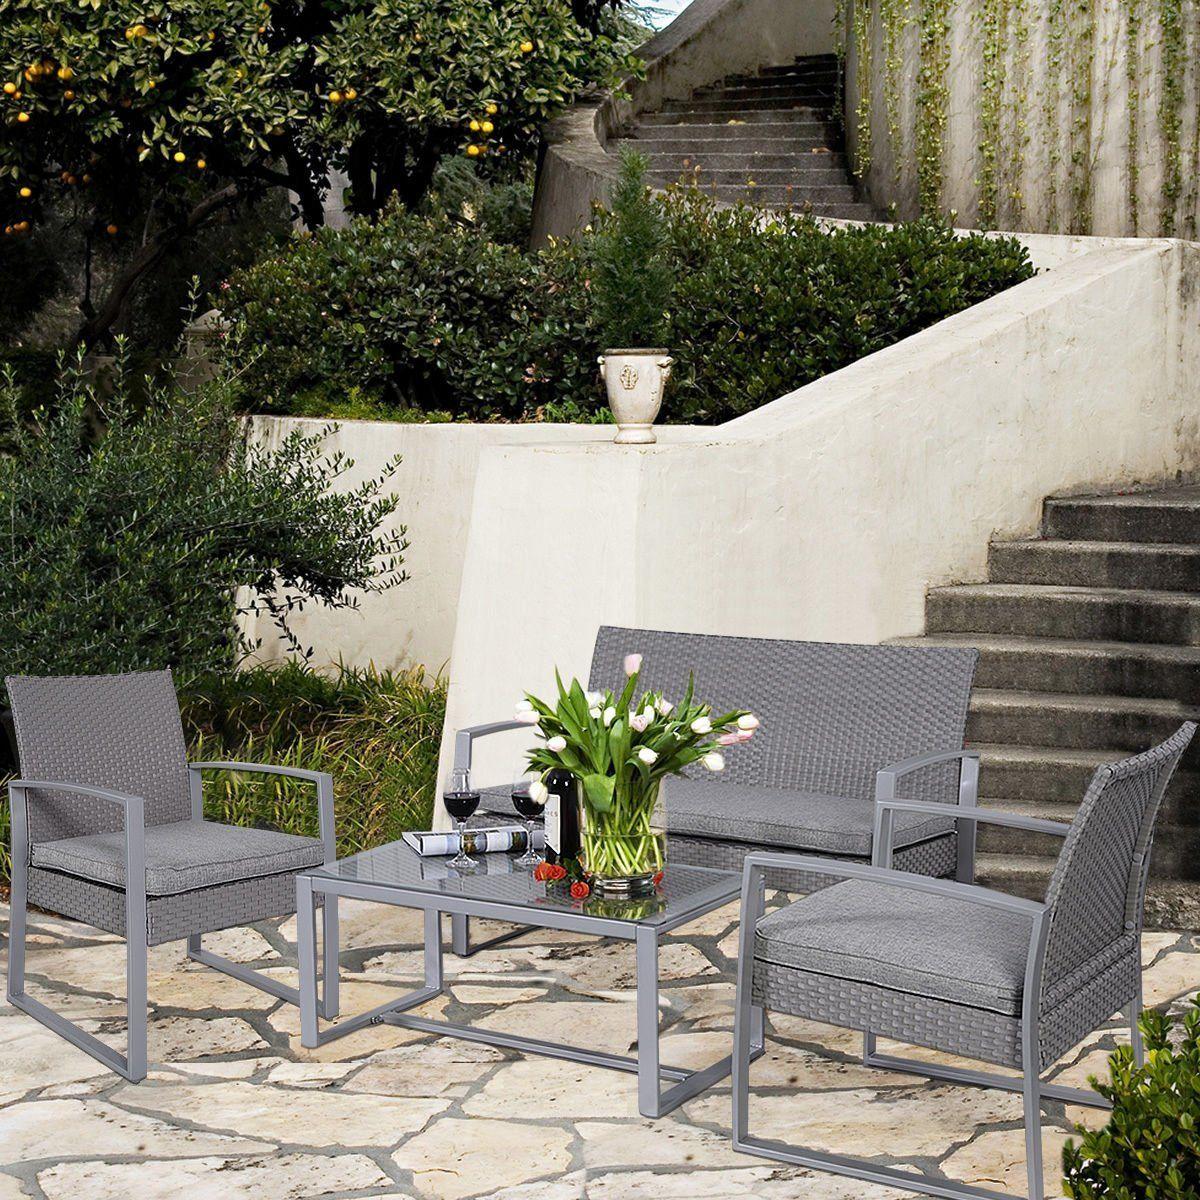 Amazon.com : Giantex 4pc Patio Furniture Set Cushioned Outdoor Wicker  Rattan Garden Lawn Sofa - Amazon.com : Giantex 4pc Patio Furniture Set Cushioned Outdoor